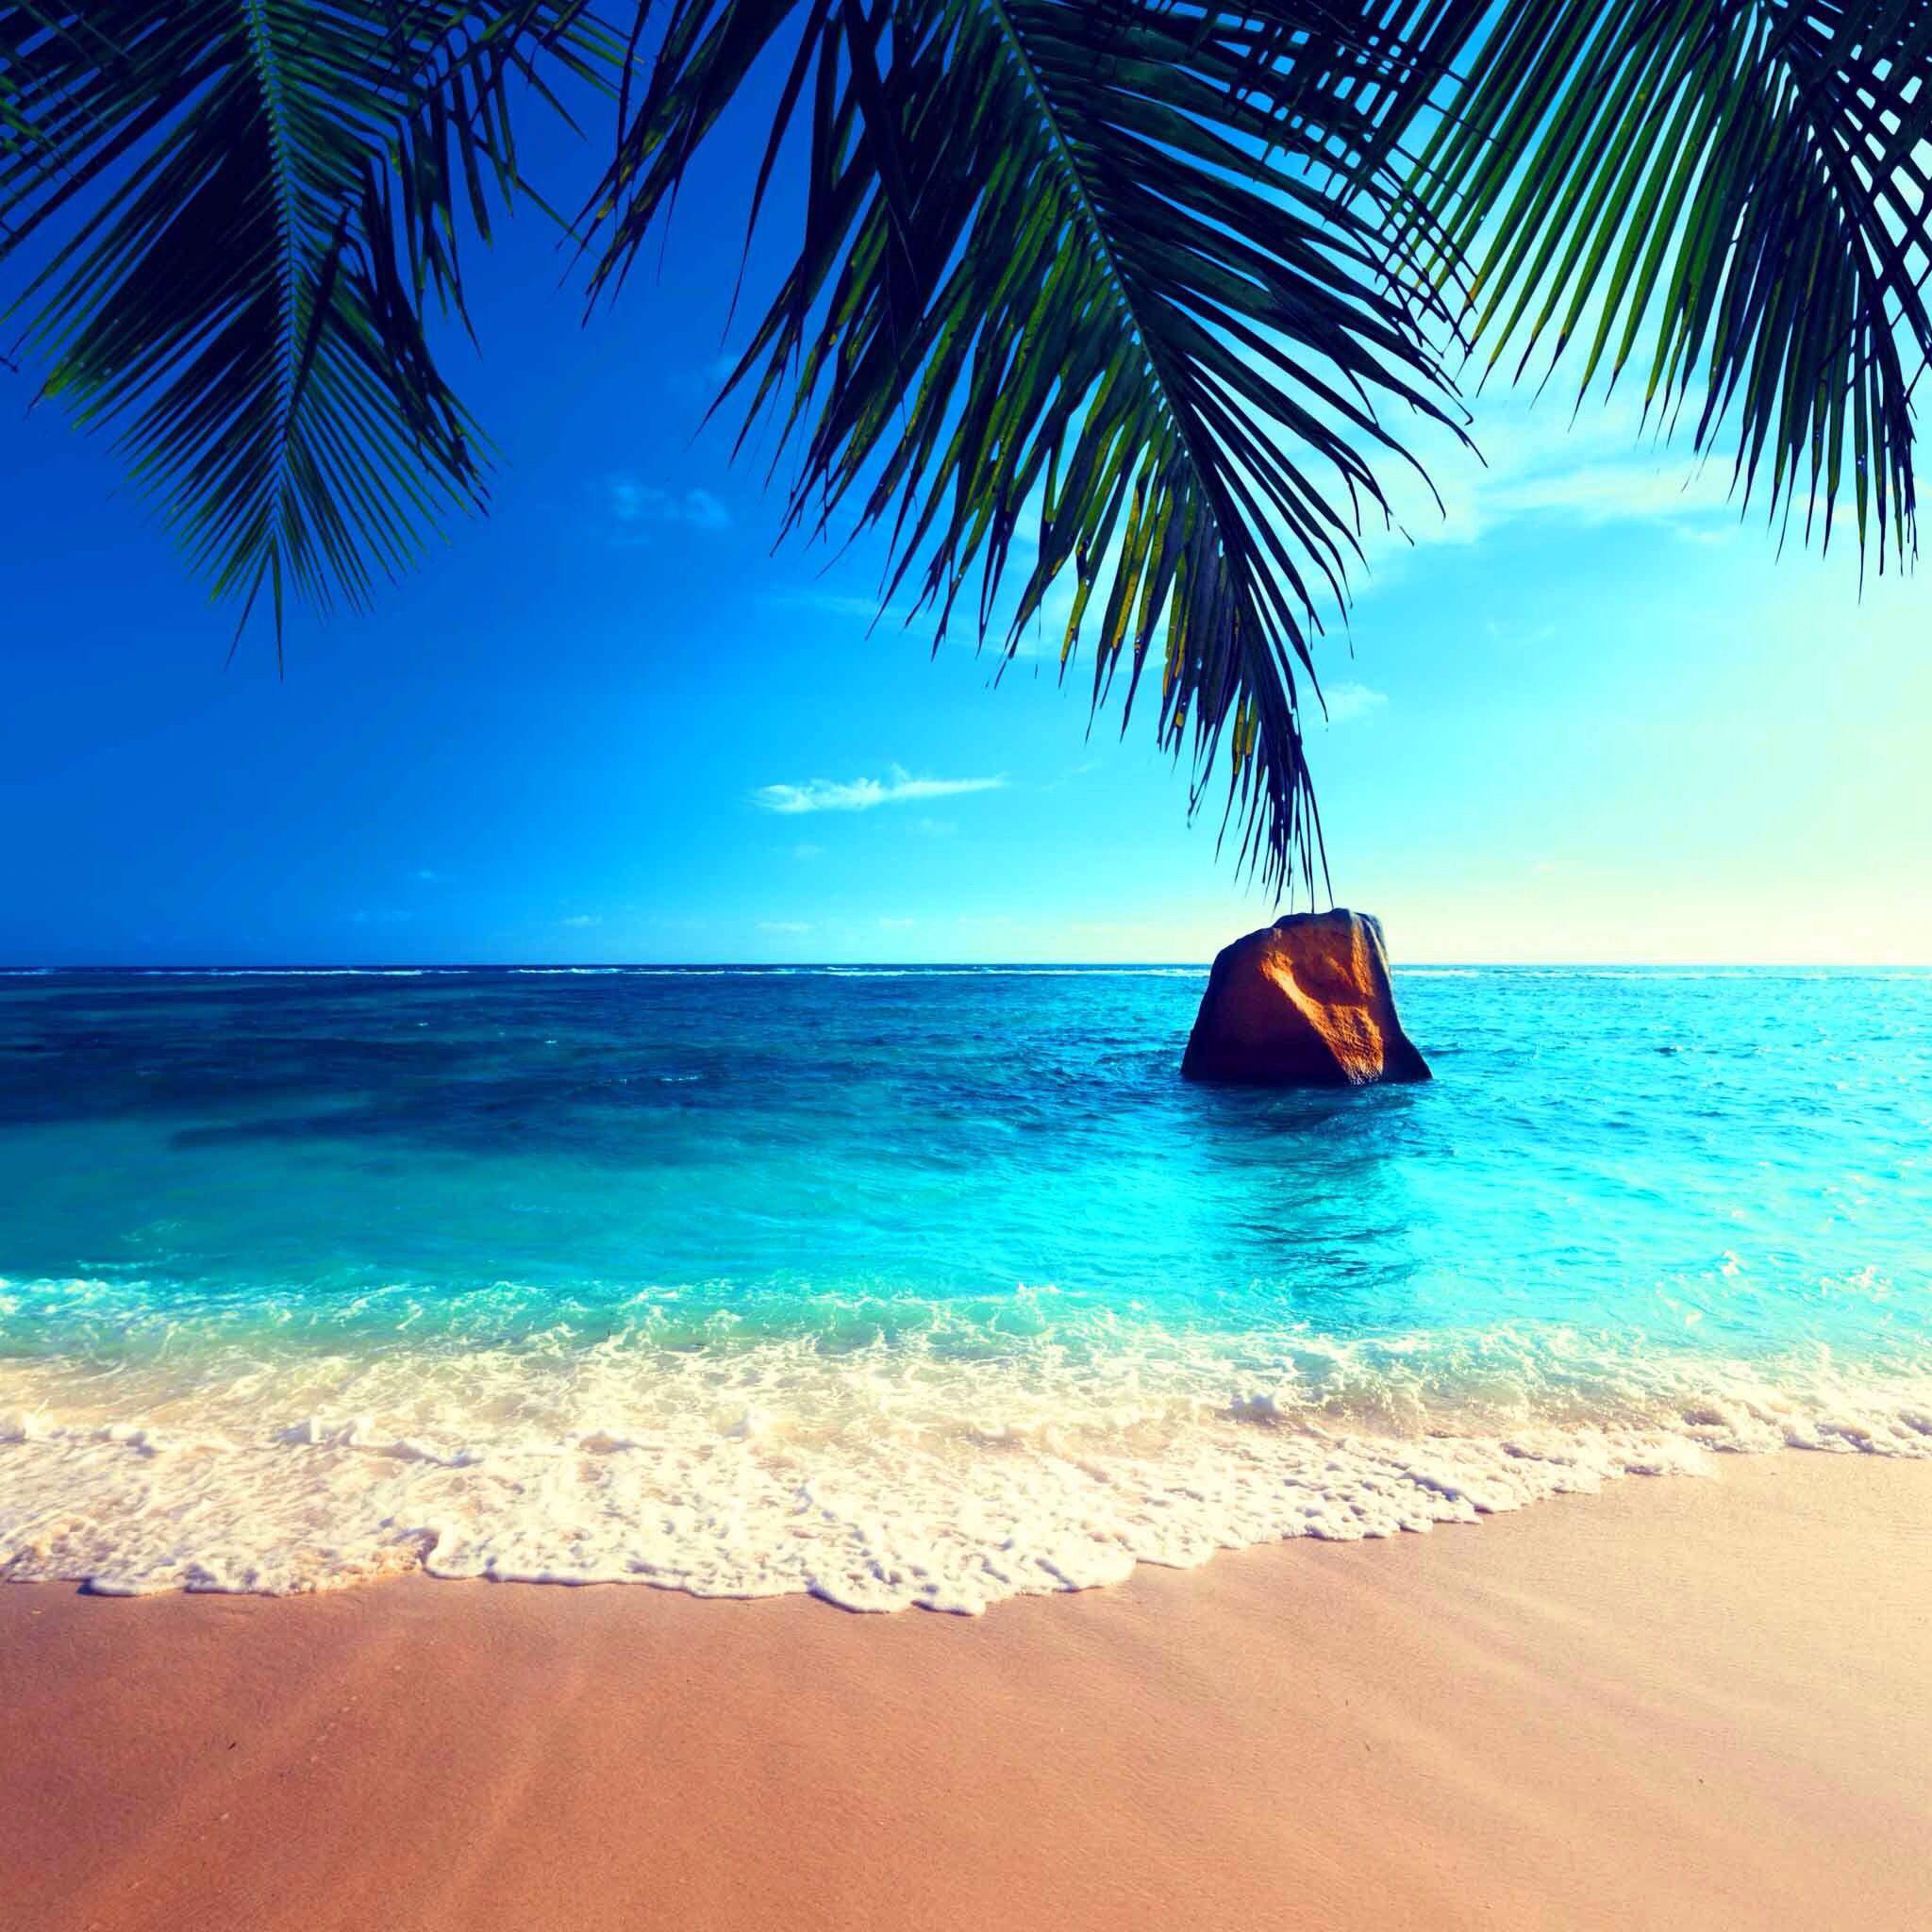 Пляж океан картинки на телефон последний раз